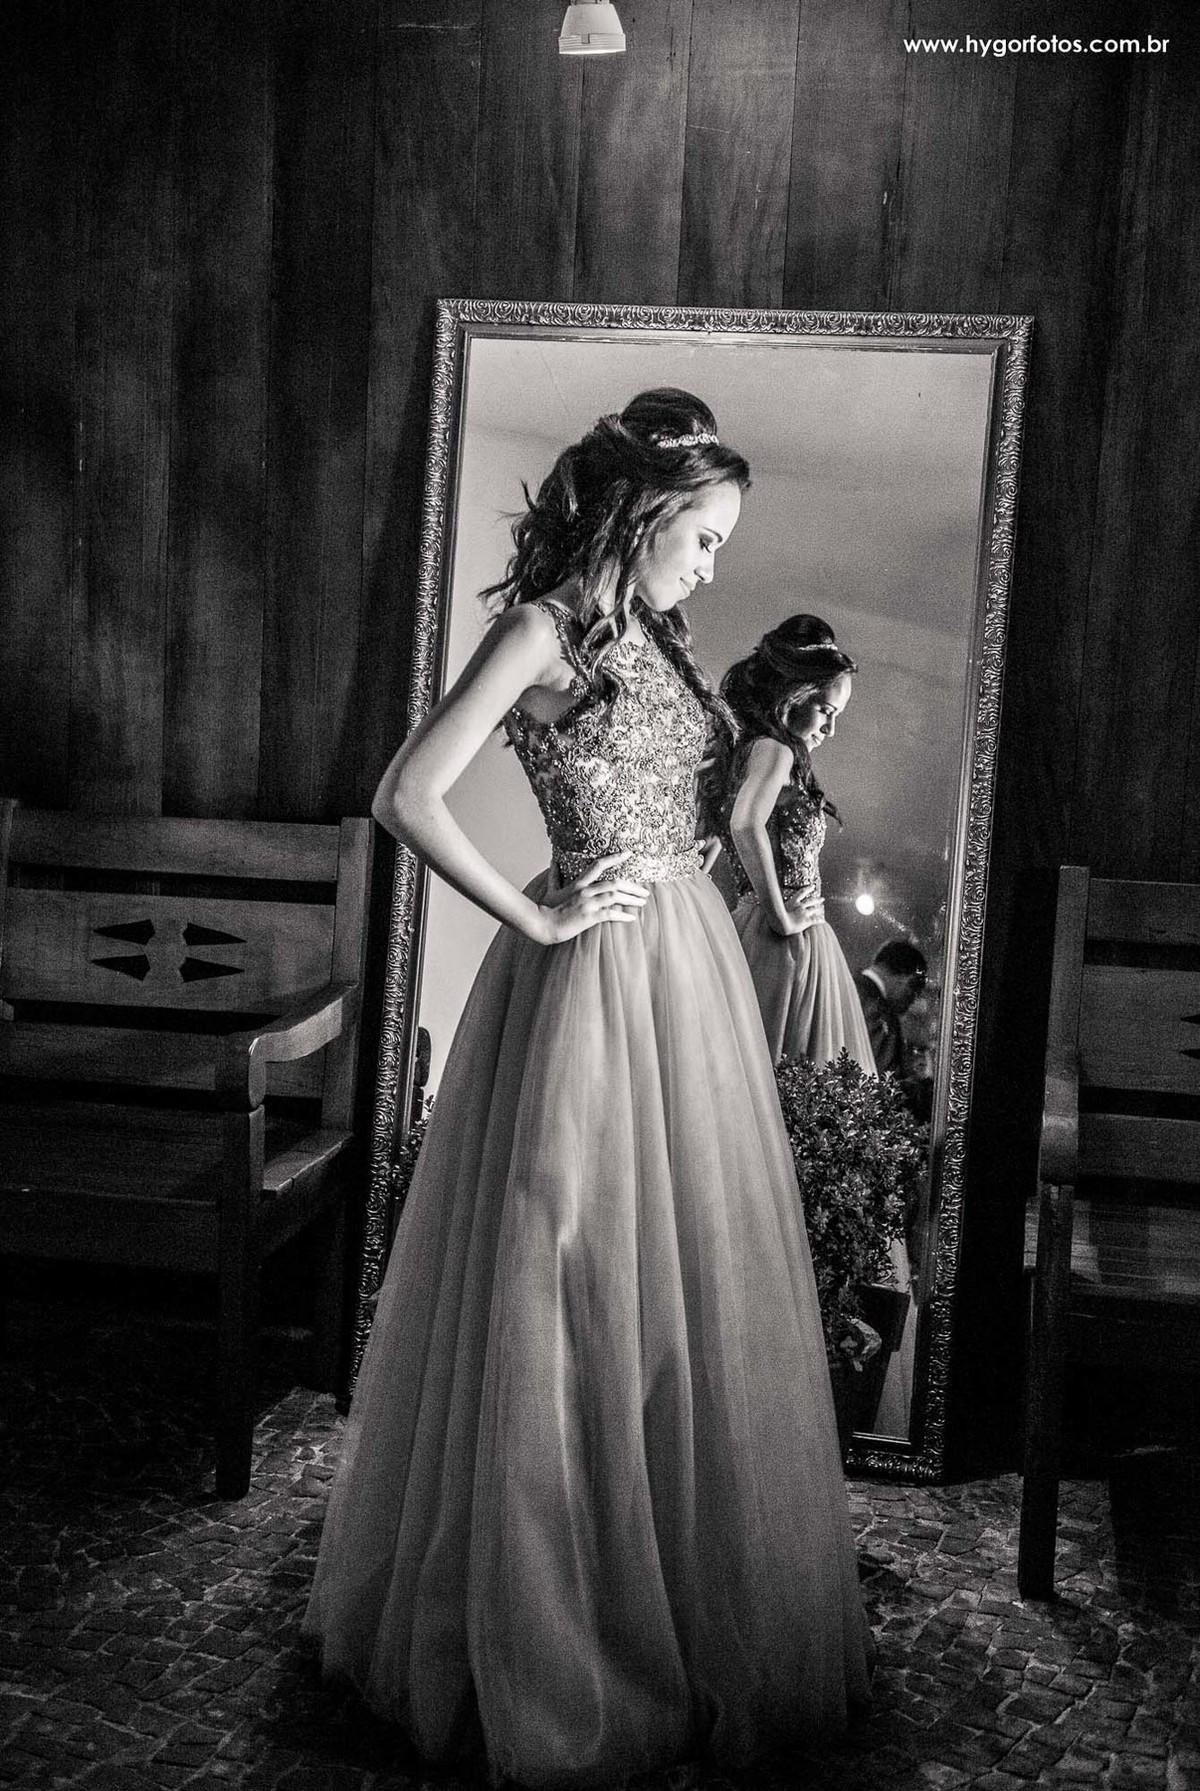 Foto de 15 anos Letícia Cavalca Guizardi